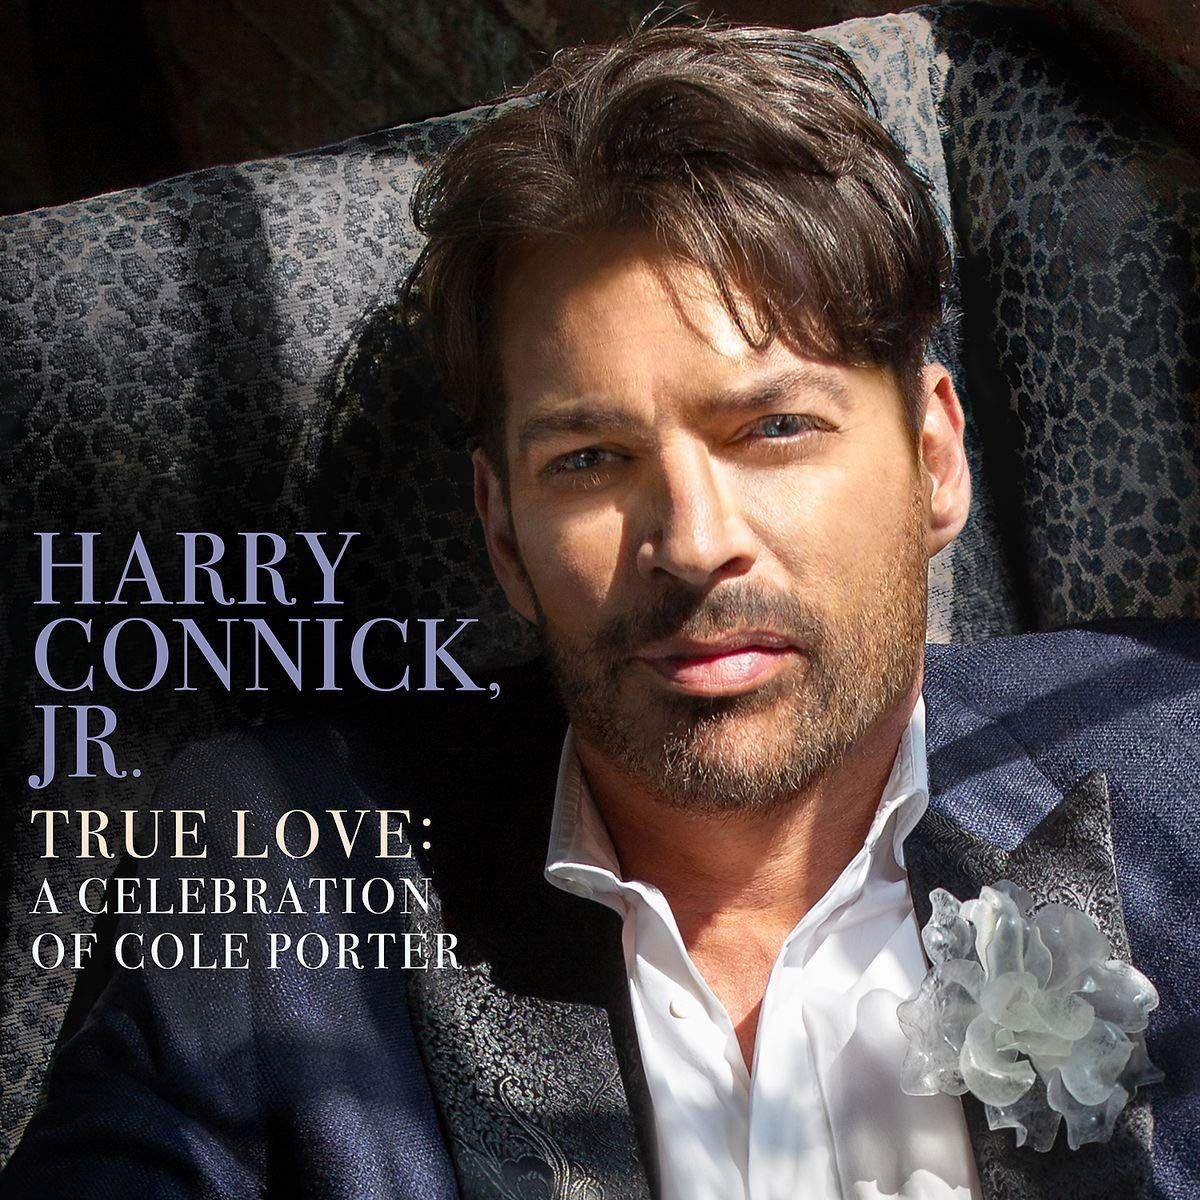 CONNICK HARRY JR. – True Love. A Celebration Of Cole Porter